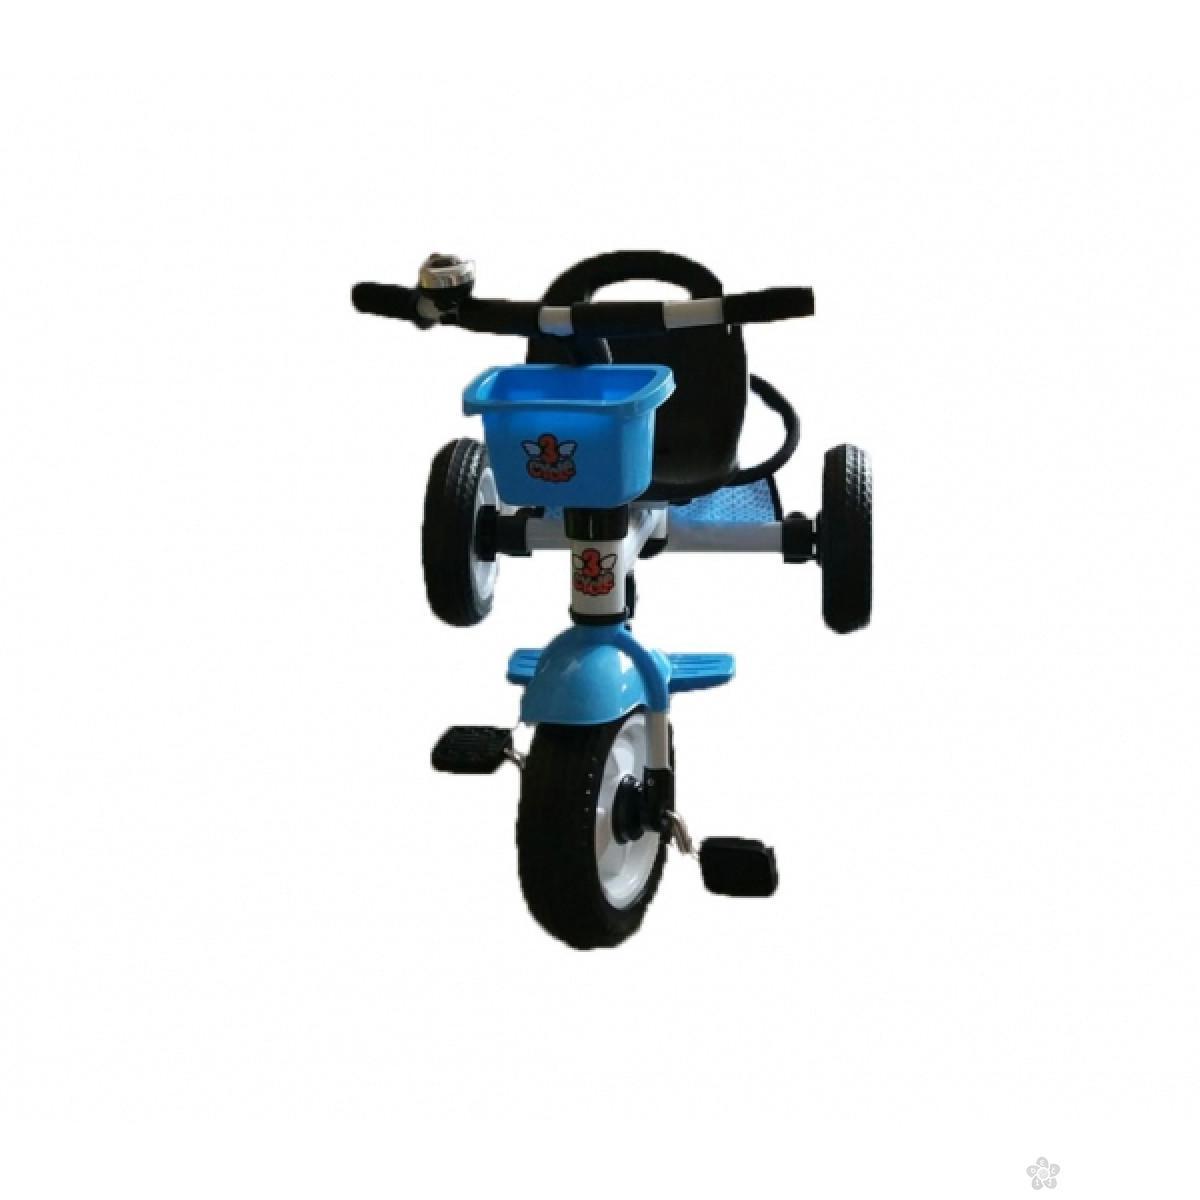 Tricikl 3 Cycle mini, 6890104, plavi